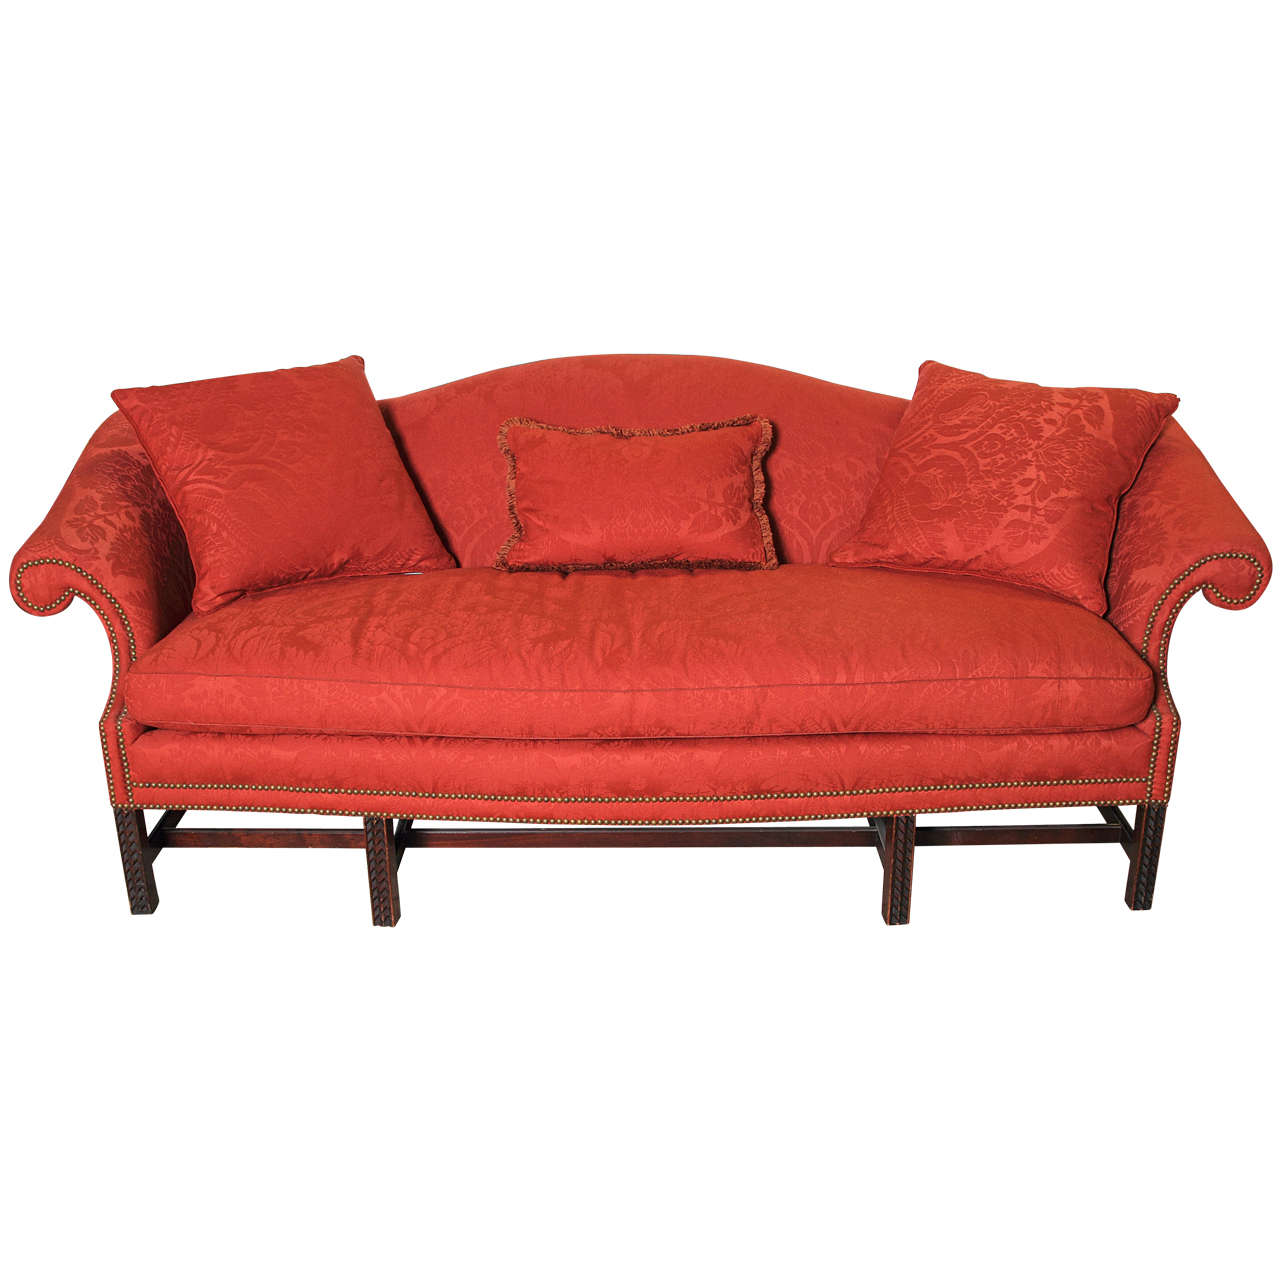 Full Size of English Chippendale Style Camel Back Sofa For Sale At 1stdibs Dauerschläfer Ottomane Schlafsofa Liegefläche 180x200 Zweisitzer Garnitur 2 Teilig Mit Sofa Chippendale Sofa